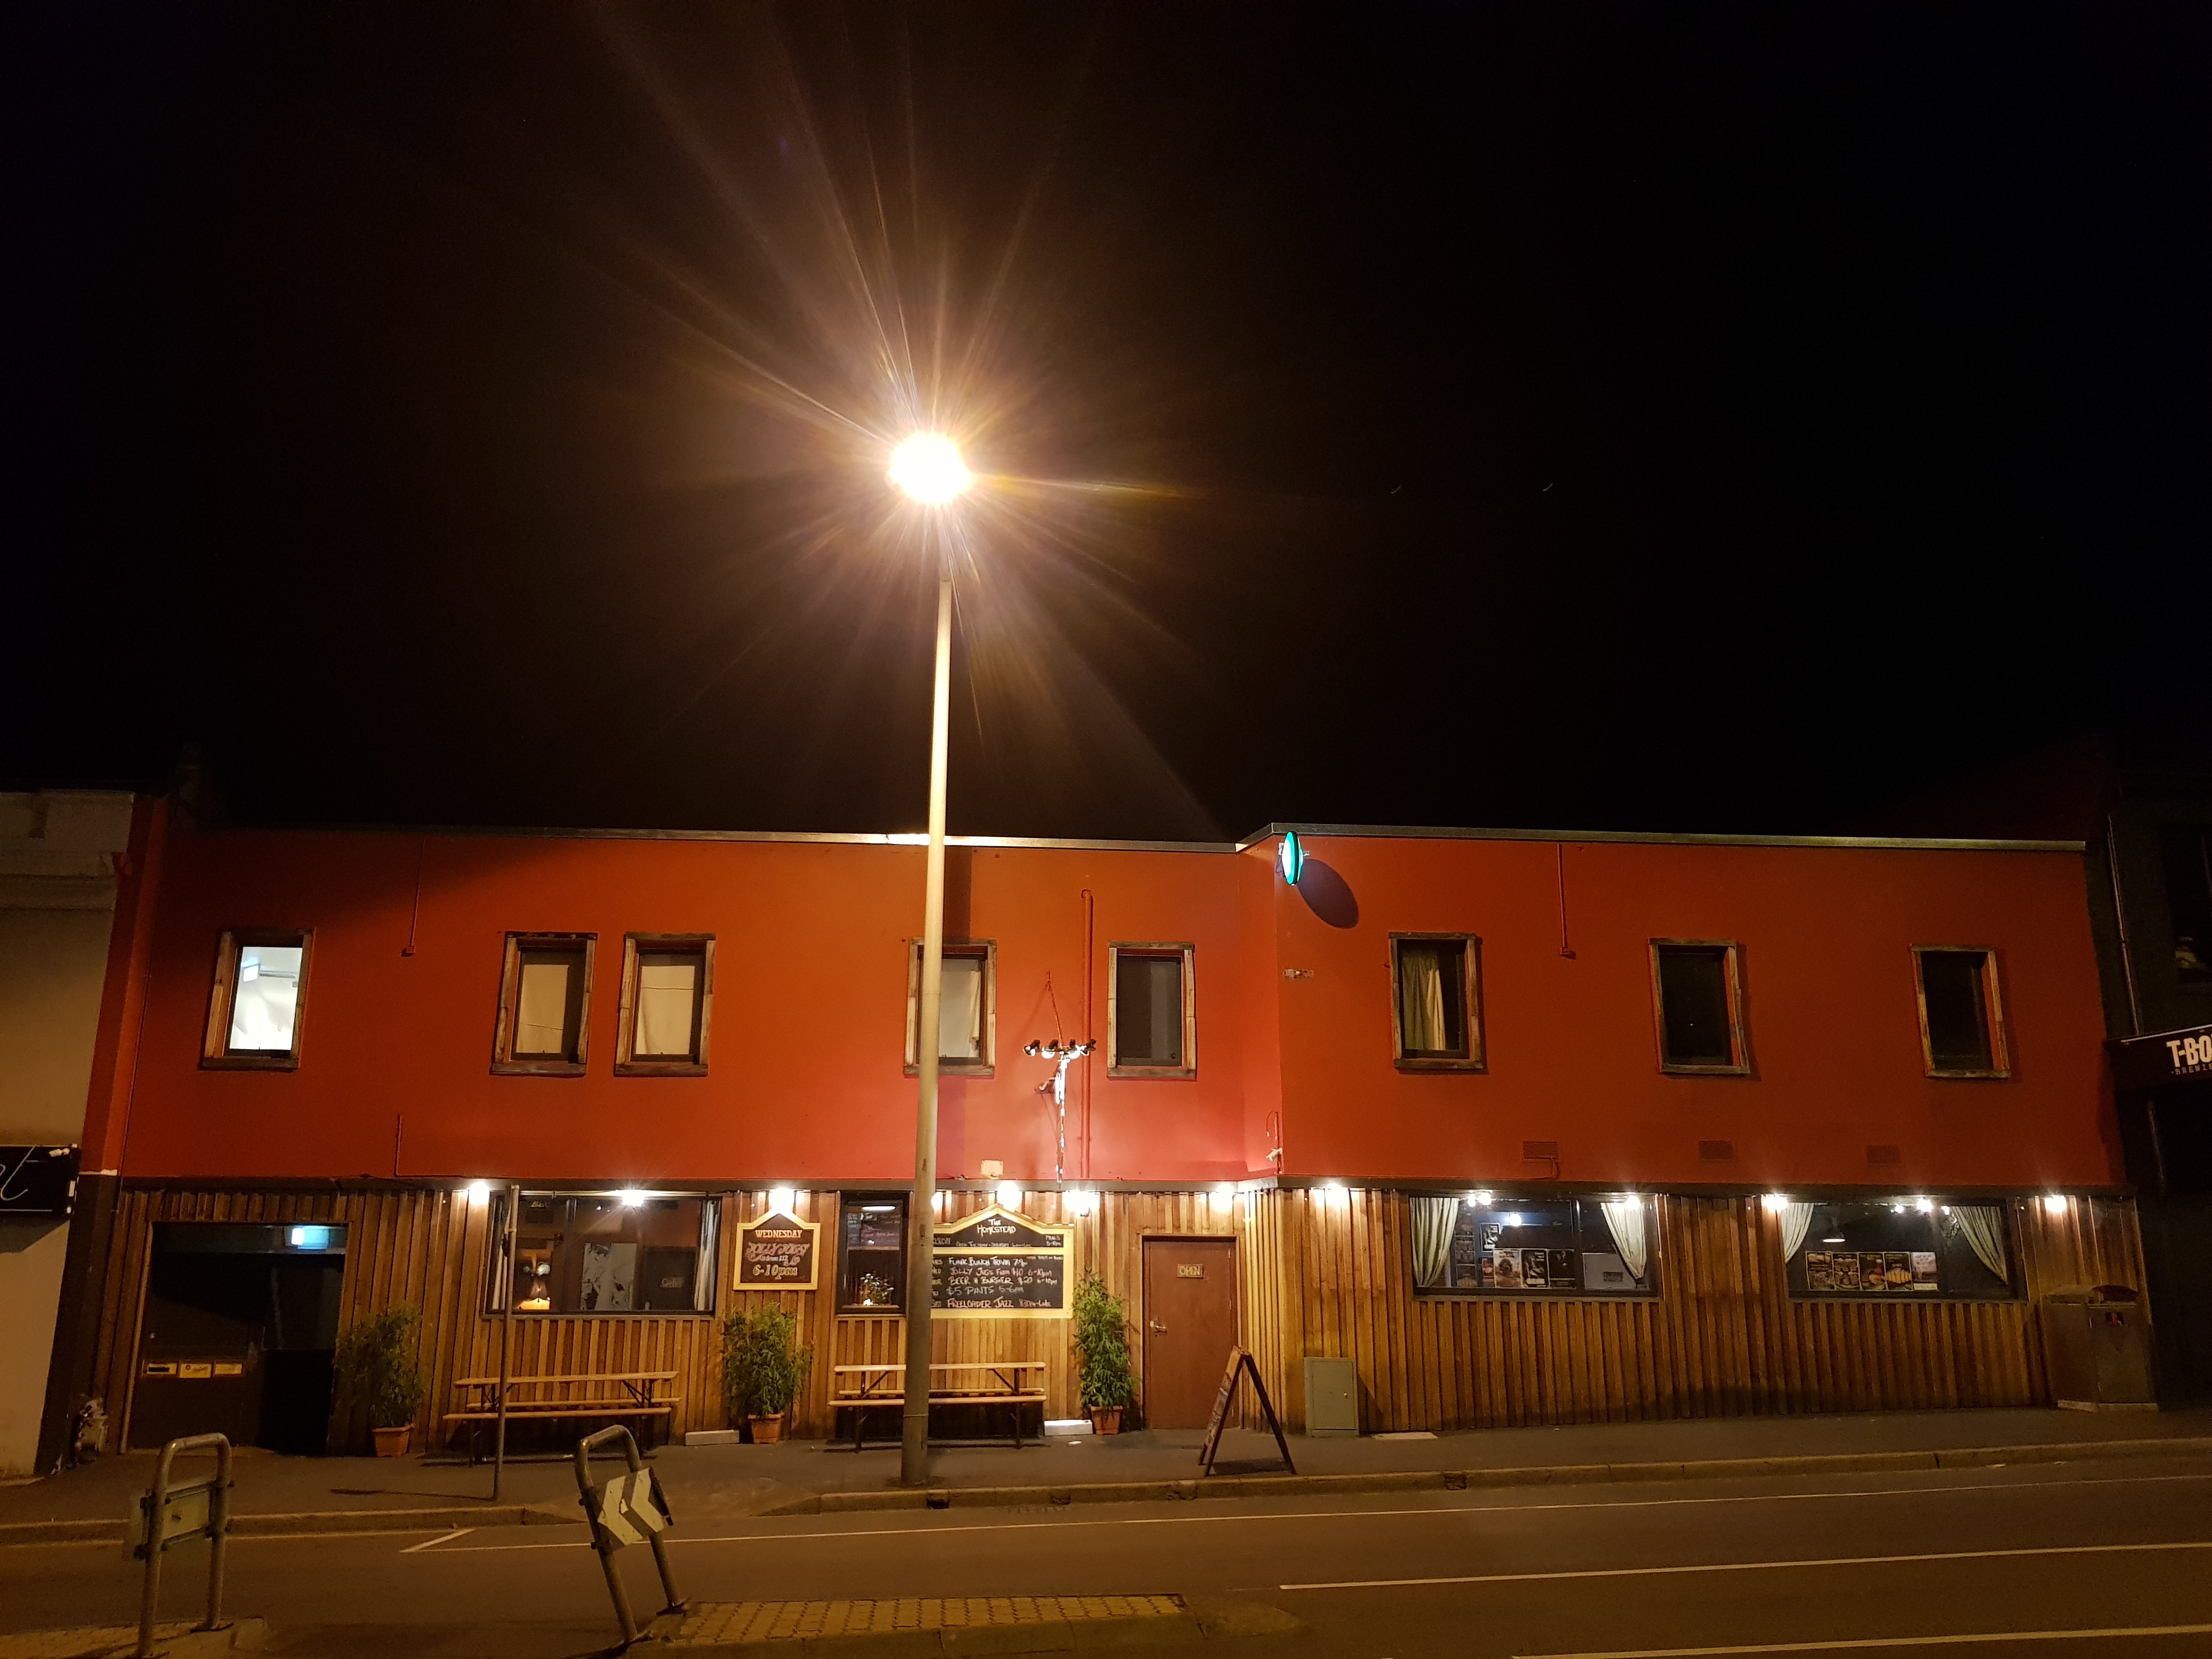 ImpressiveNorth Hobart  Hotel offering Bar, Eatery, Live Music & Accommodation.